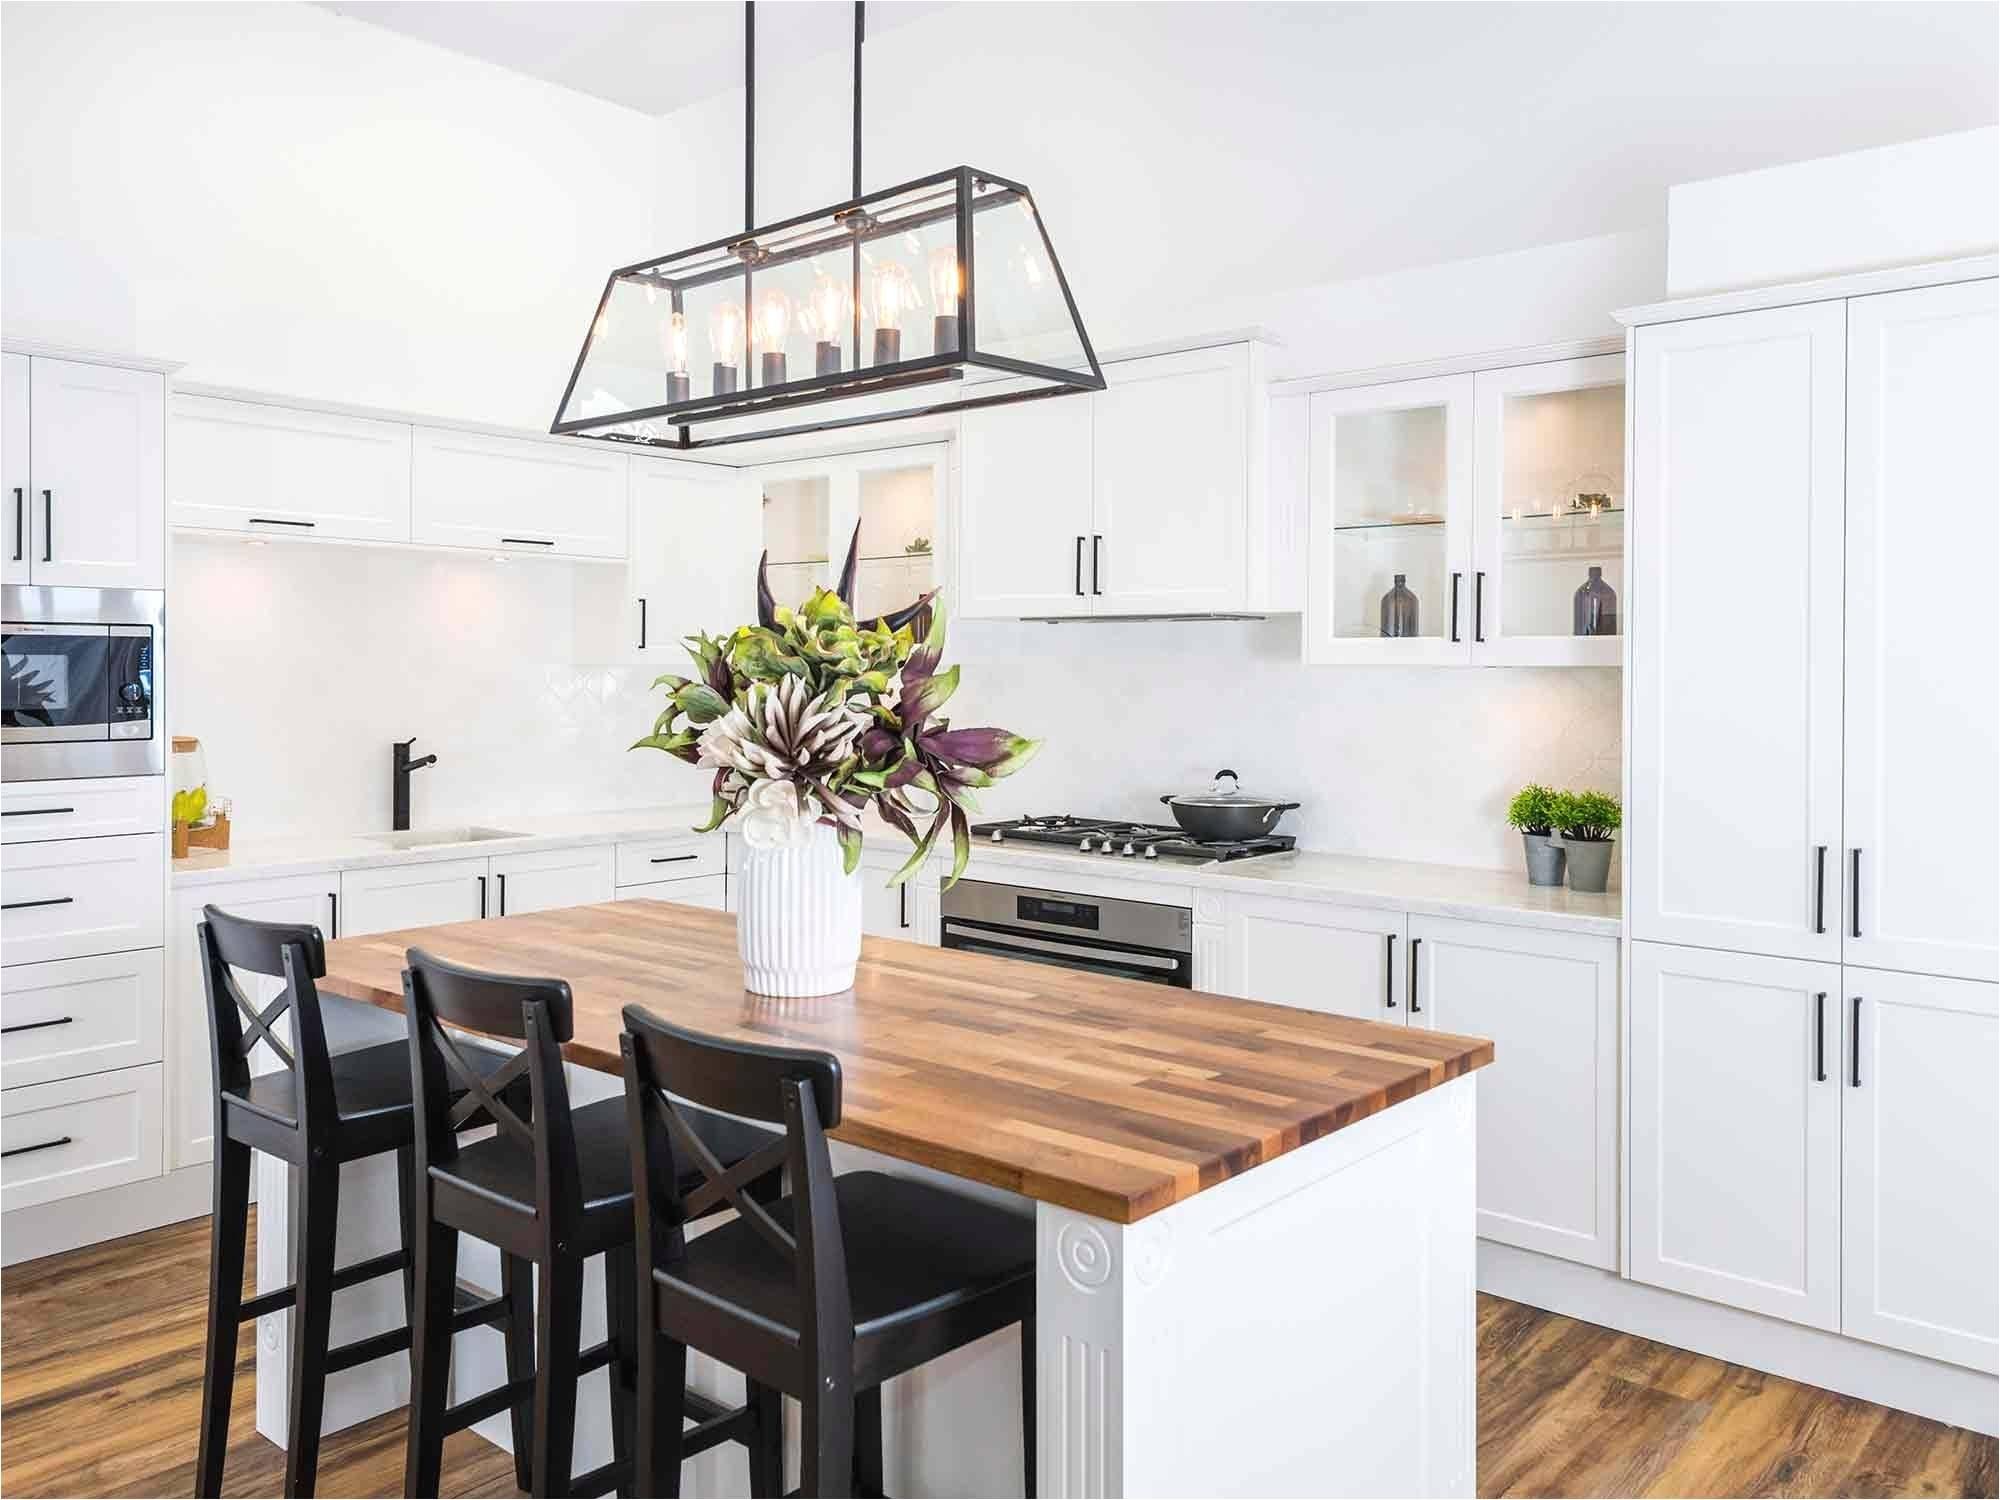 u shaped kitchen ideas wondrous u shaped kitchen designs with breakfast bar of u shaped kitchen ideas 1